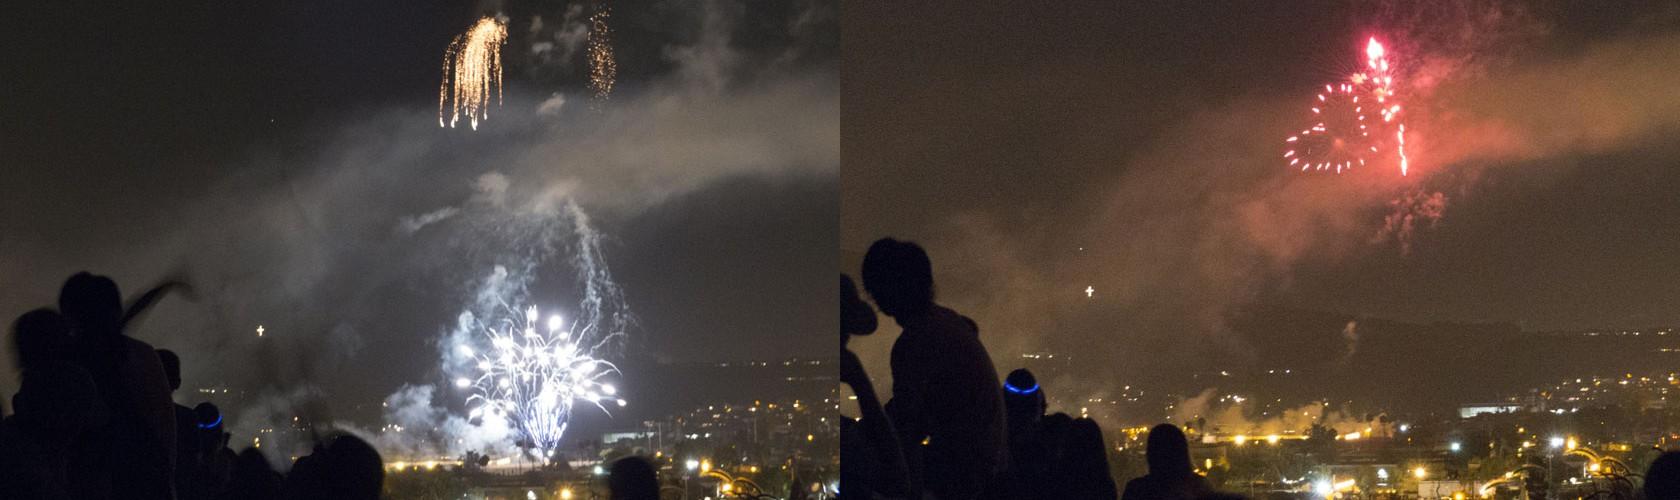 san-marcos-fireworks